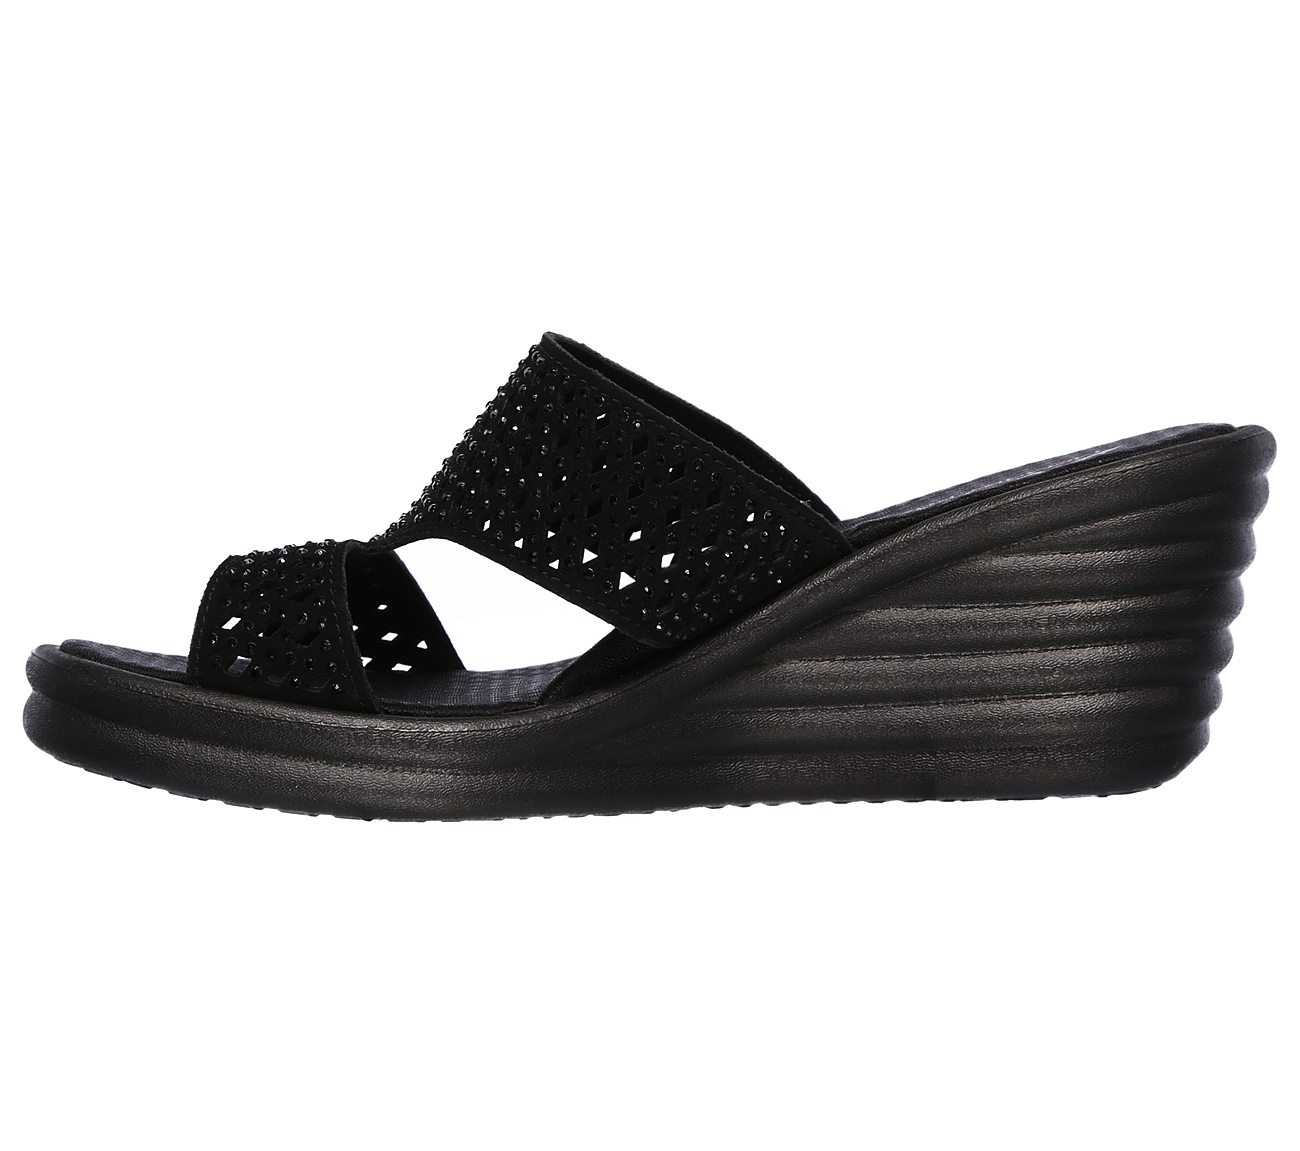 9beb248908c5 Buy SKECHERS Rumblers Wave - Ibiza Summer Cali Shoes only  59.00